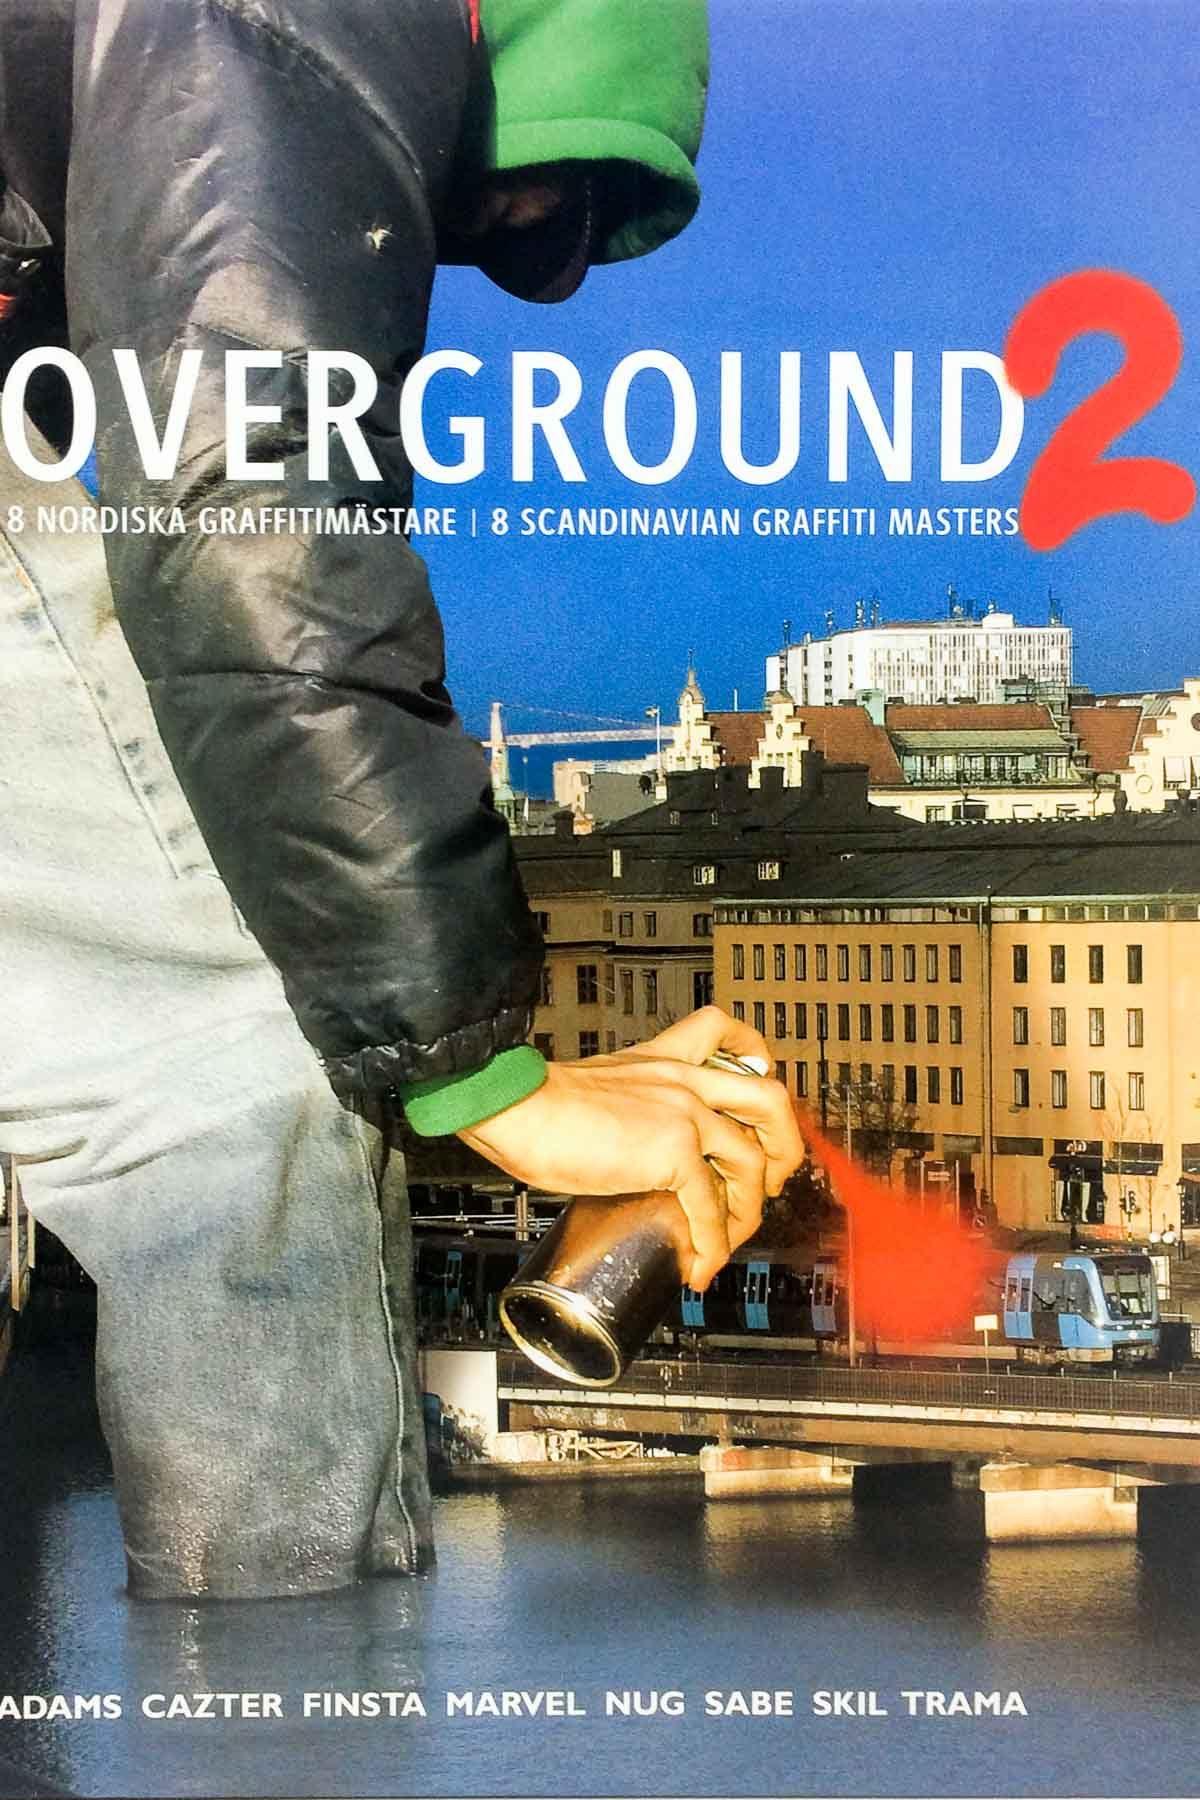 OVERGROUND 2 - 8 Scandinavian Graffitimaster di Malcolm Jacobson